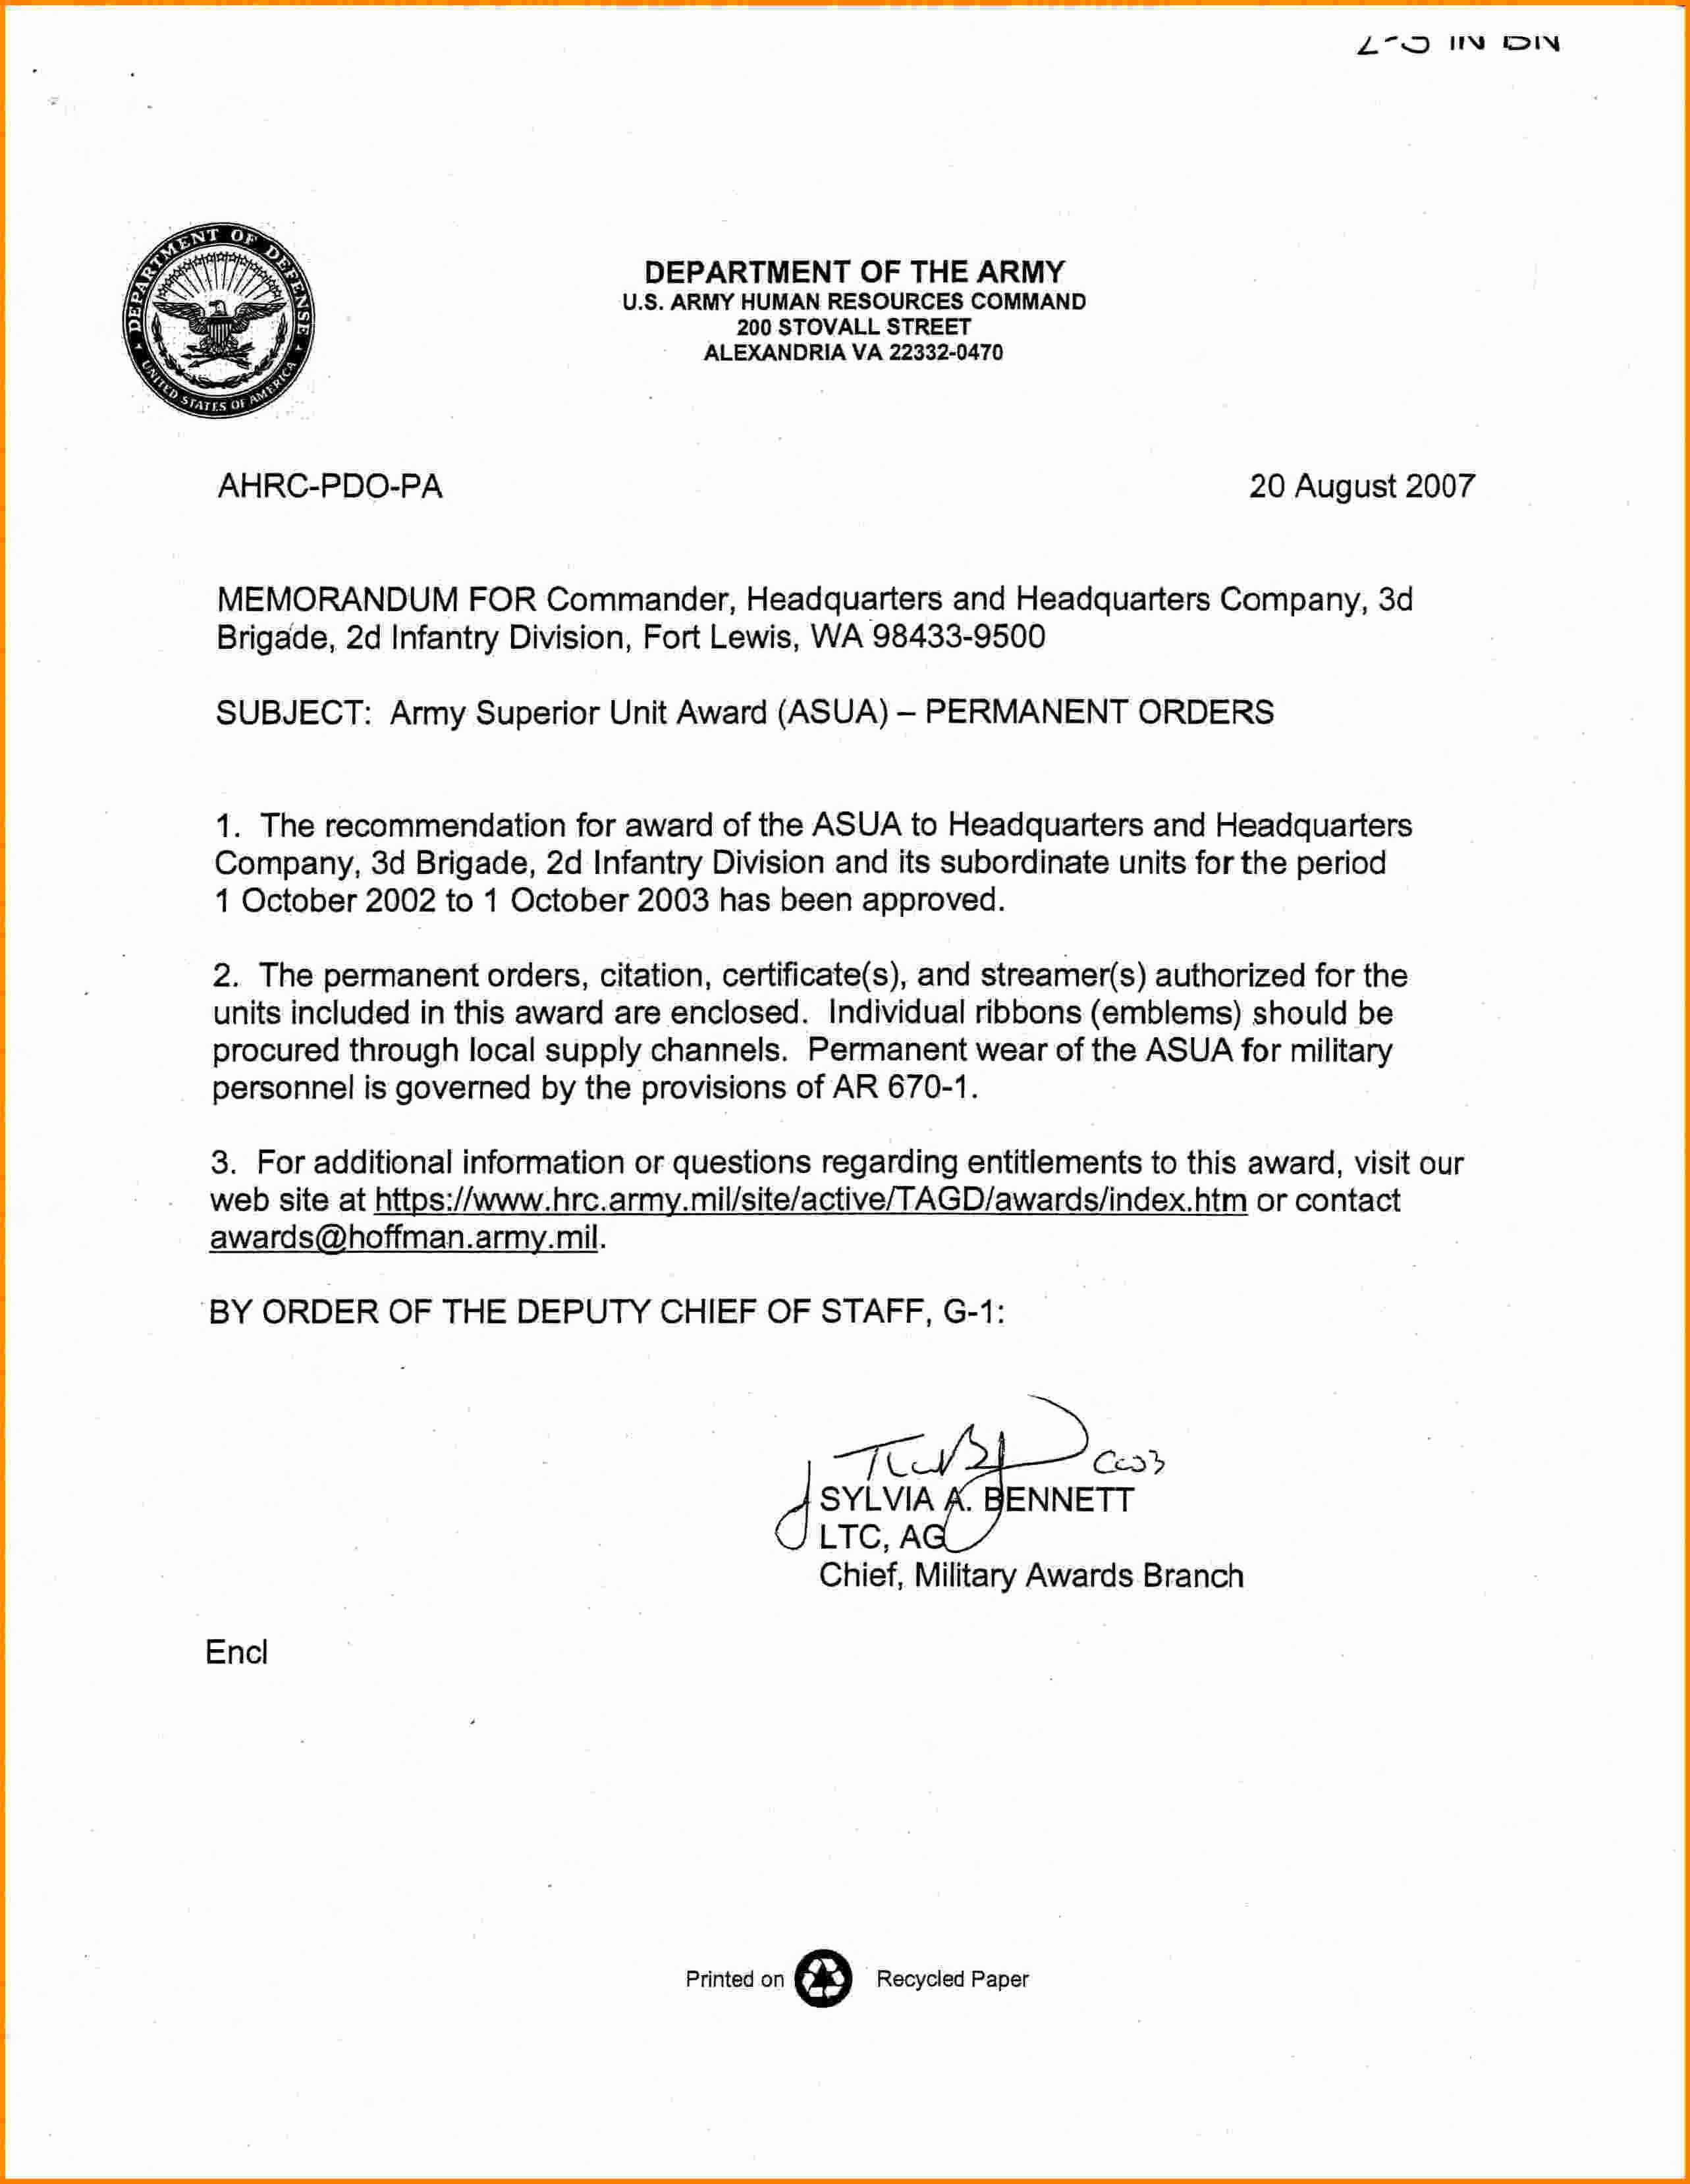 Army Memorandum for Record Template Inspirational 6 Memorandum for Record Army